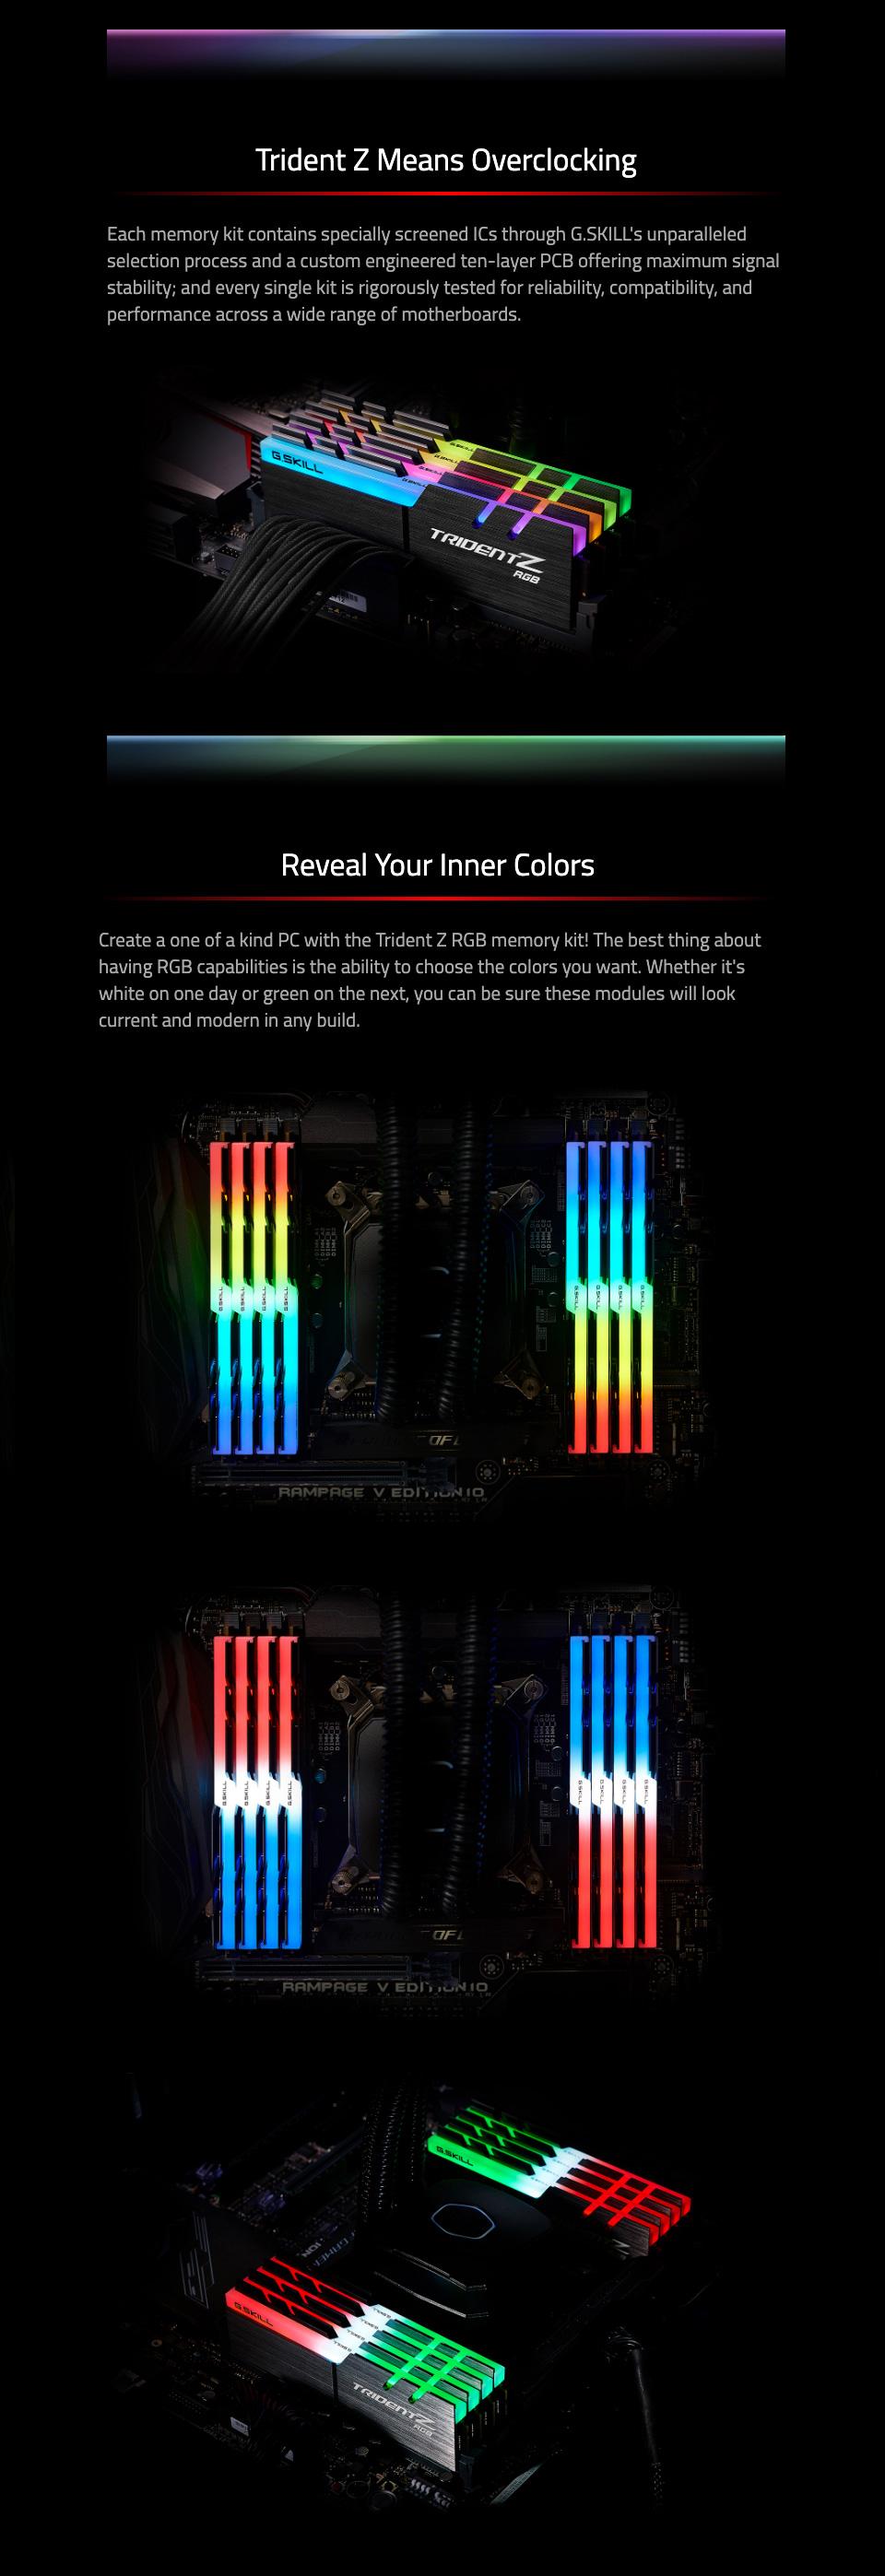 G.Skill Trident Z RGB F4-3600C18D-32GTZR 32GB (2x16GB) DDR4 features 2